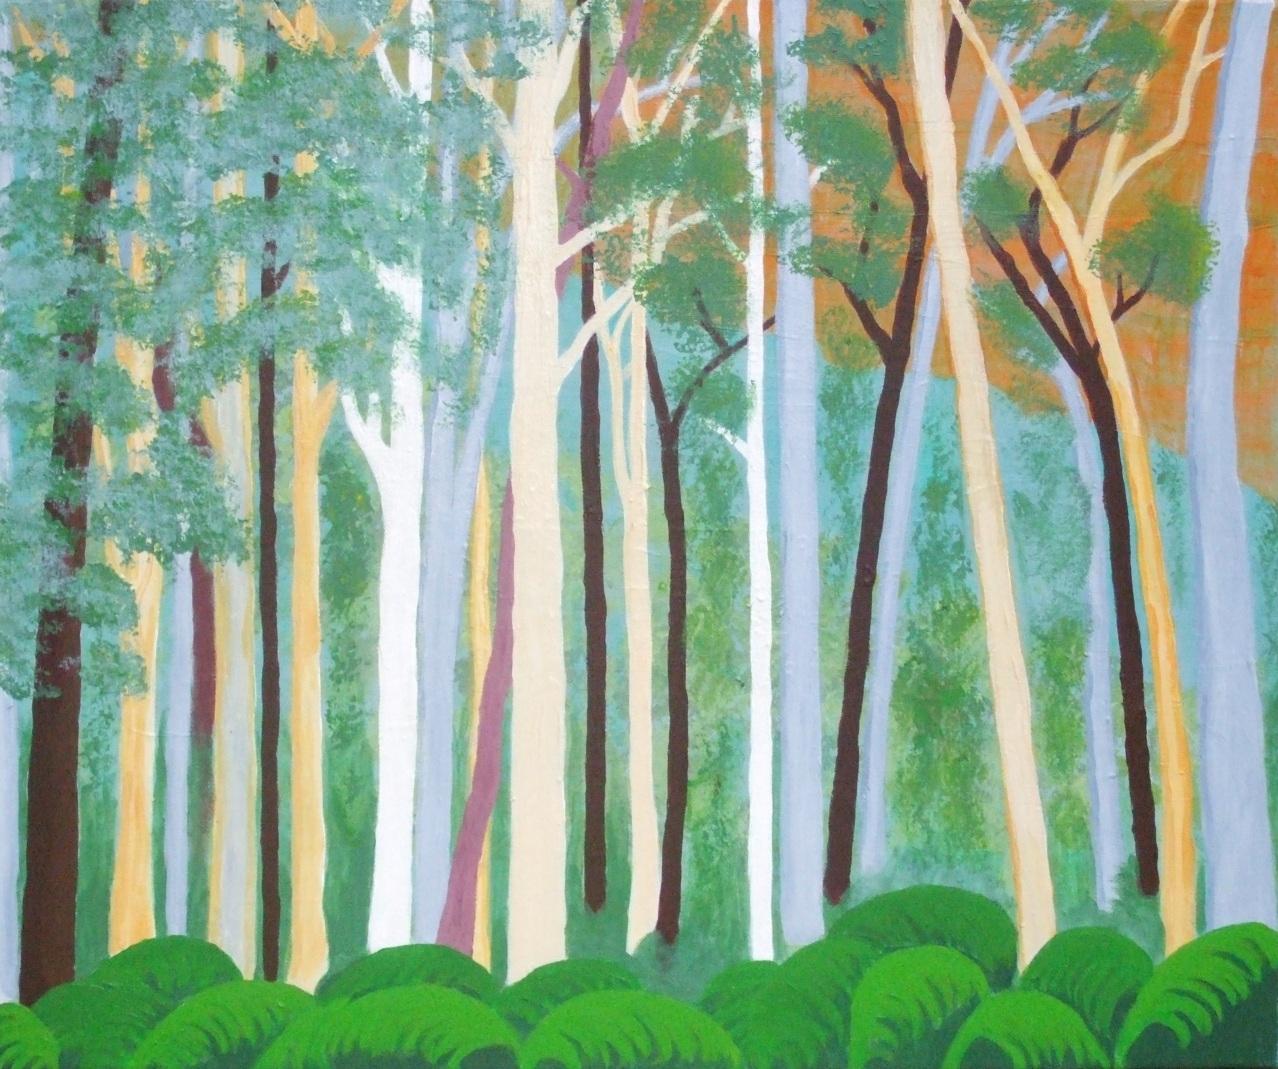 Jeanne Rudd: Blue Gum Forest, Acrylic 51 x 61cm